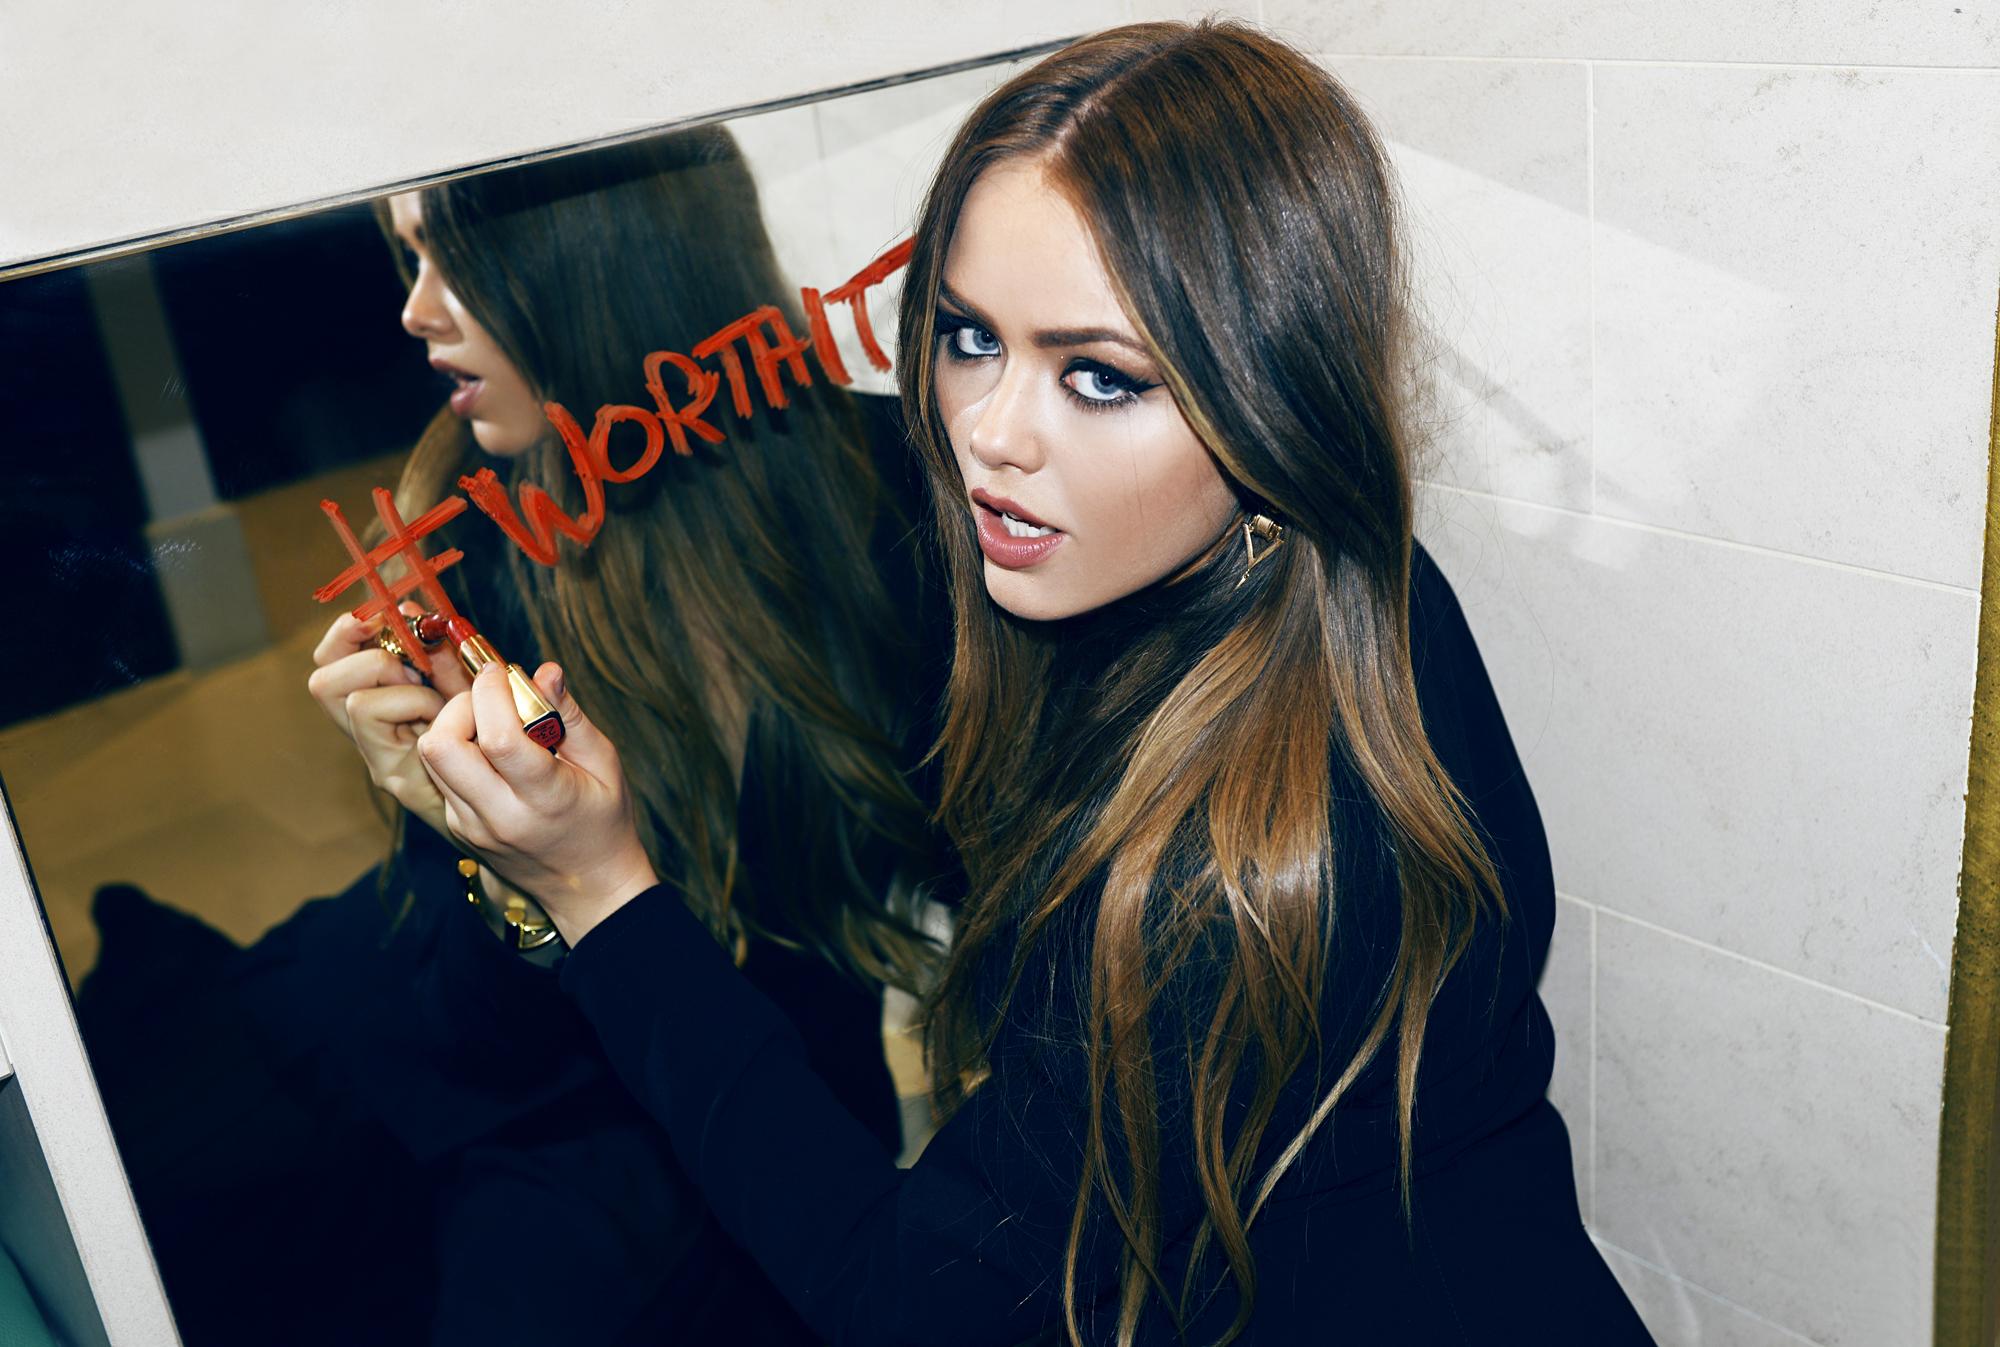 Cibelle x Kristina | L'OrealStreet_32